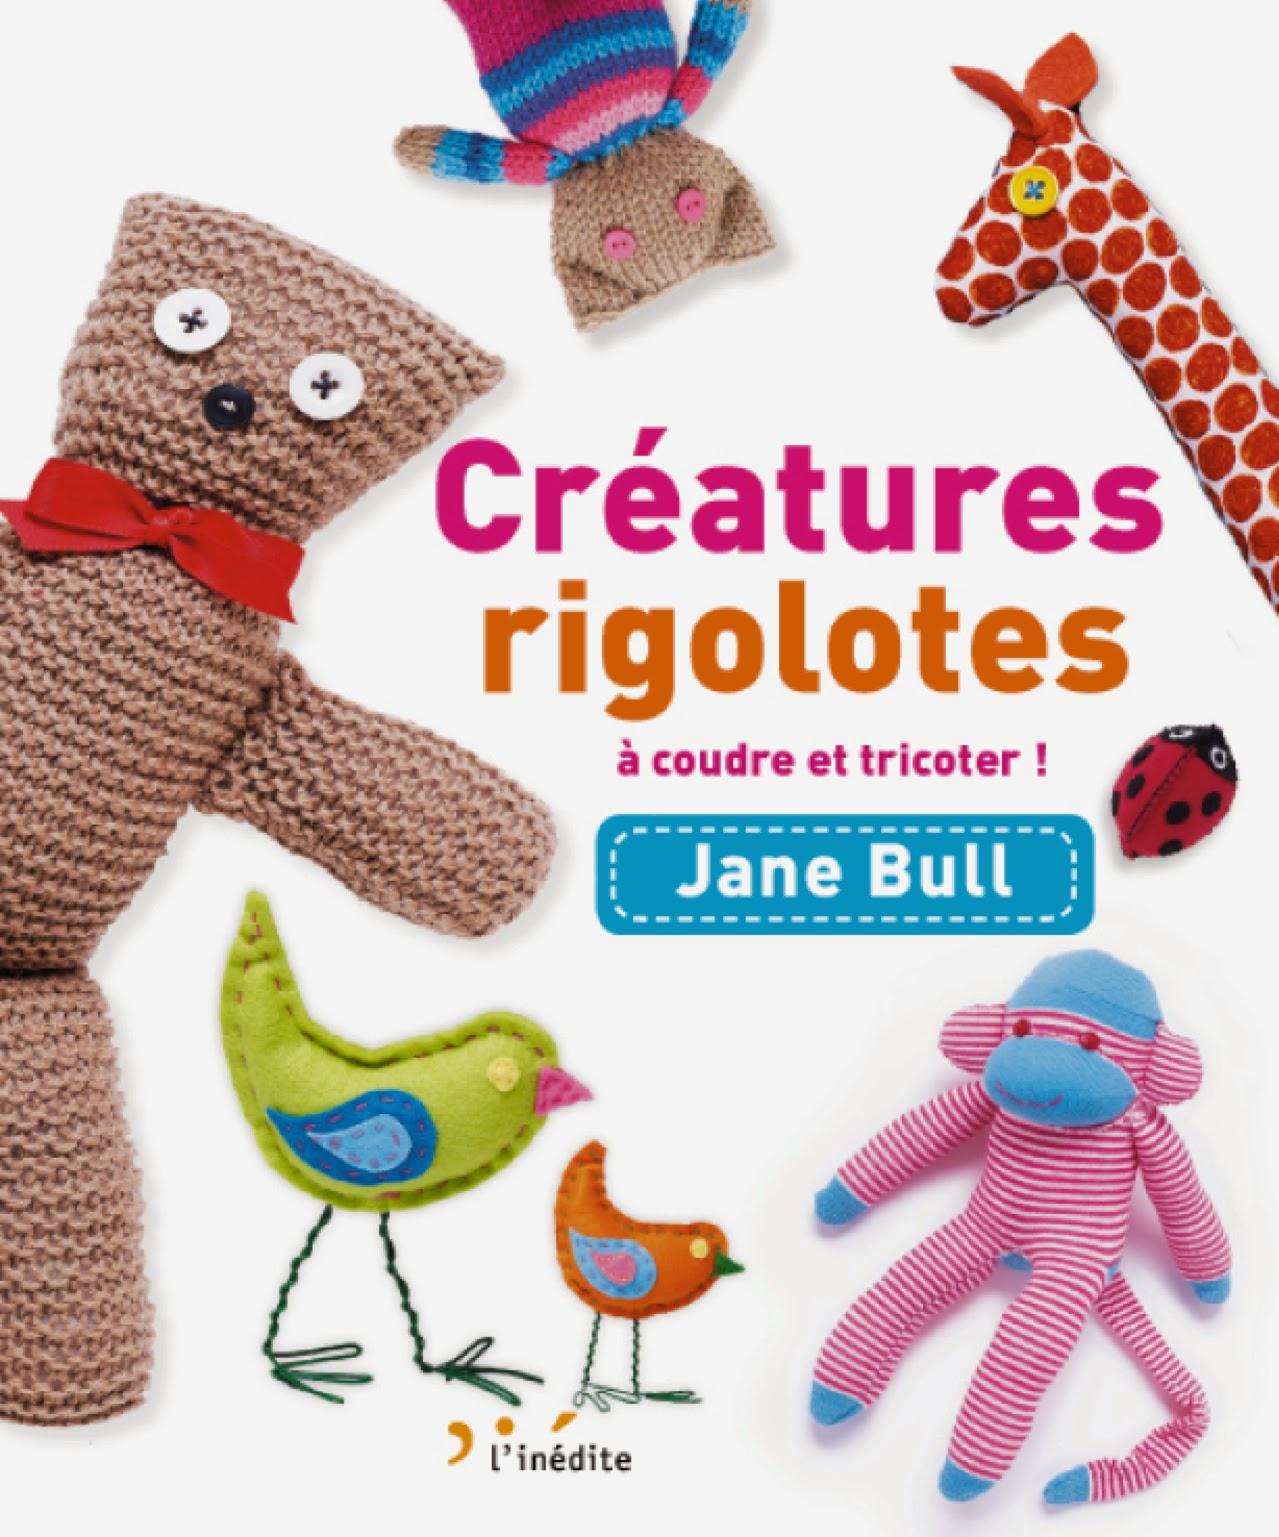 http://bit.ly/livre-creatures-rigolotes